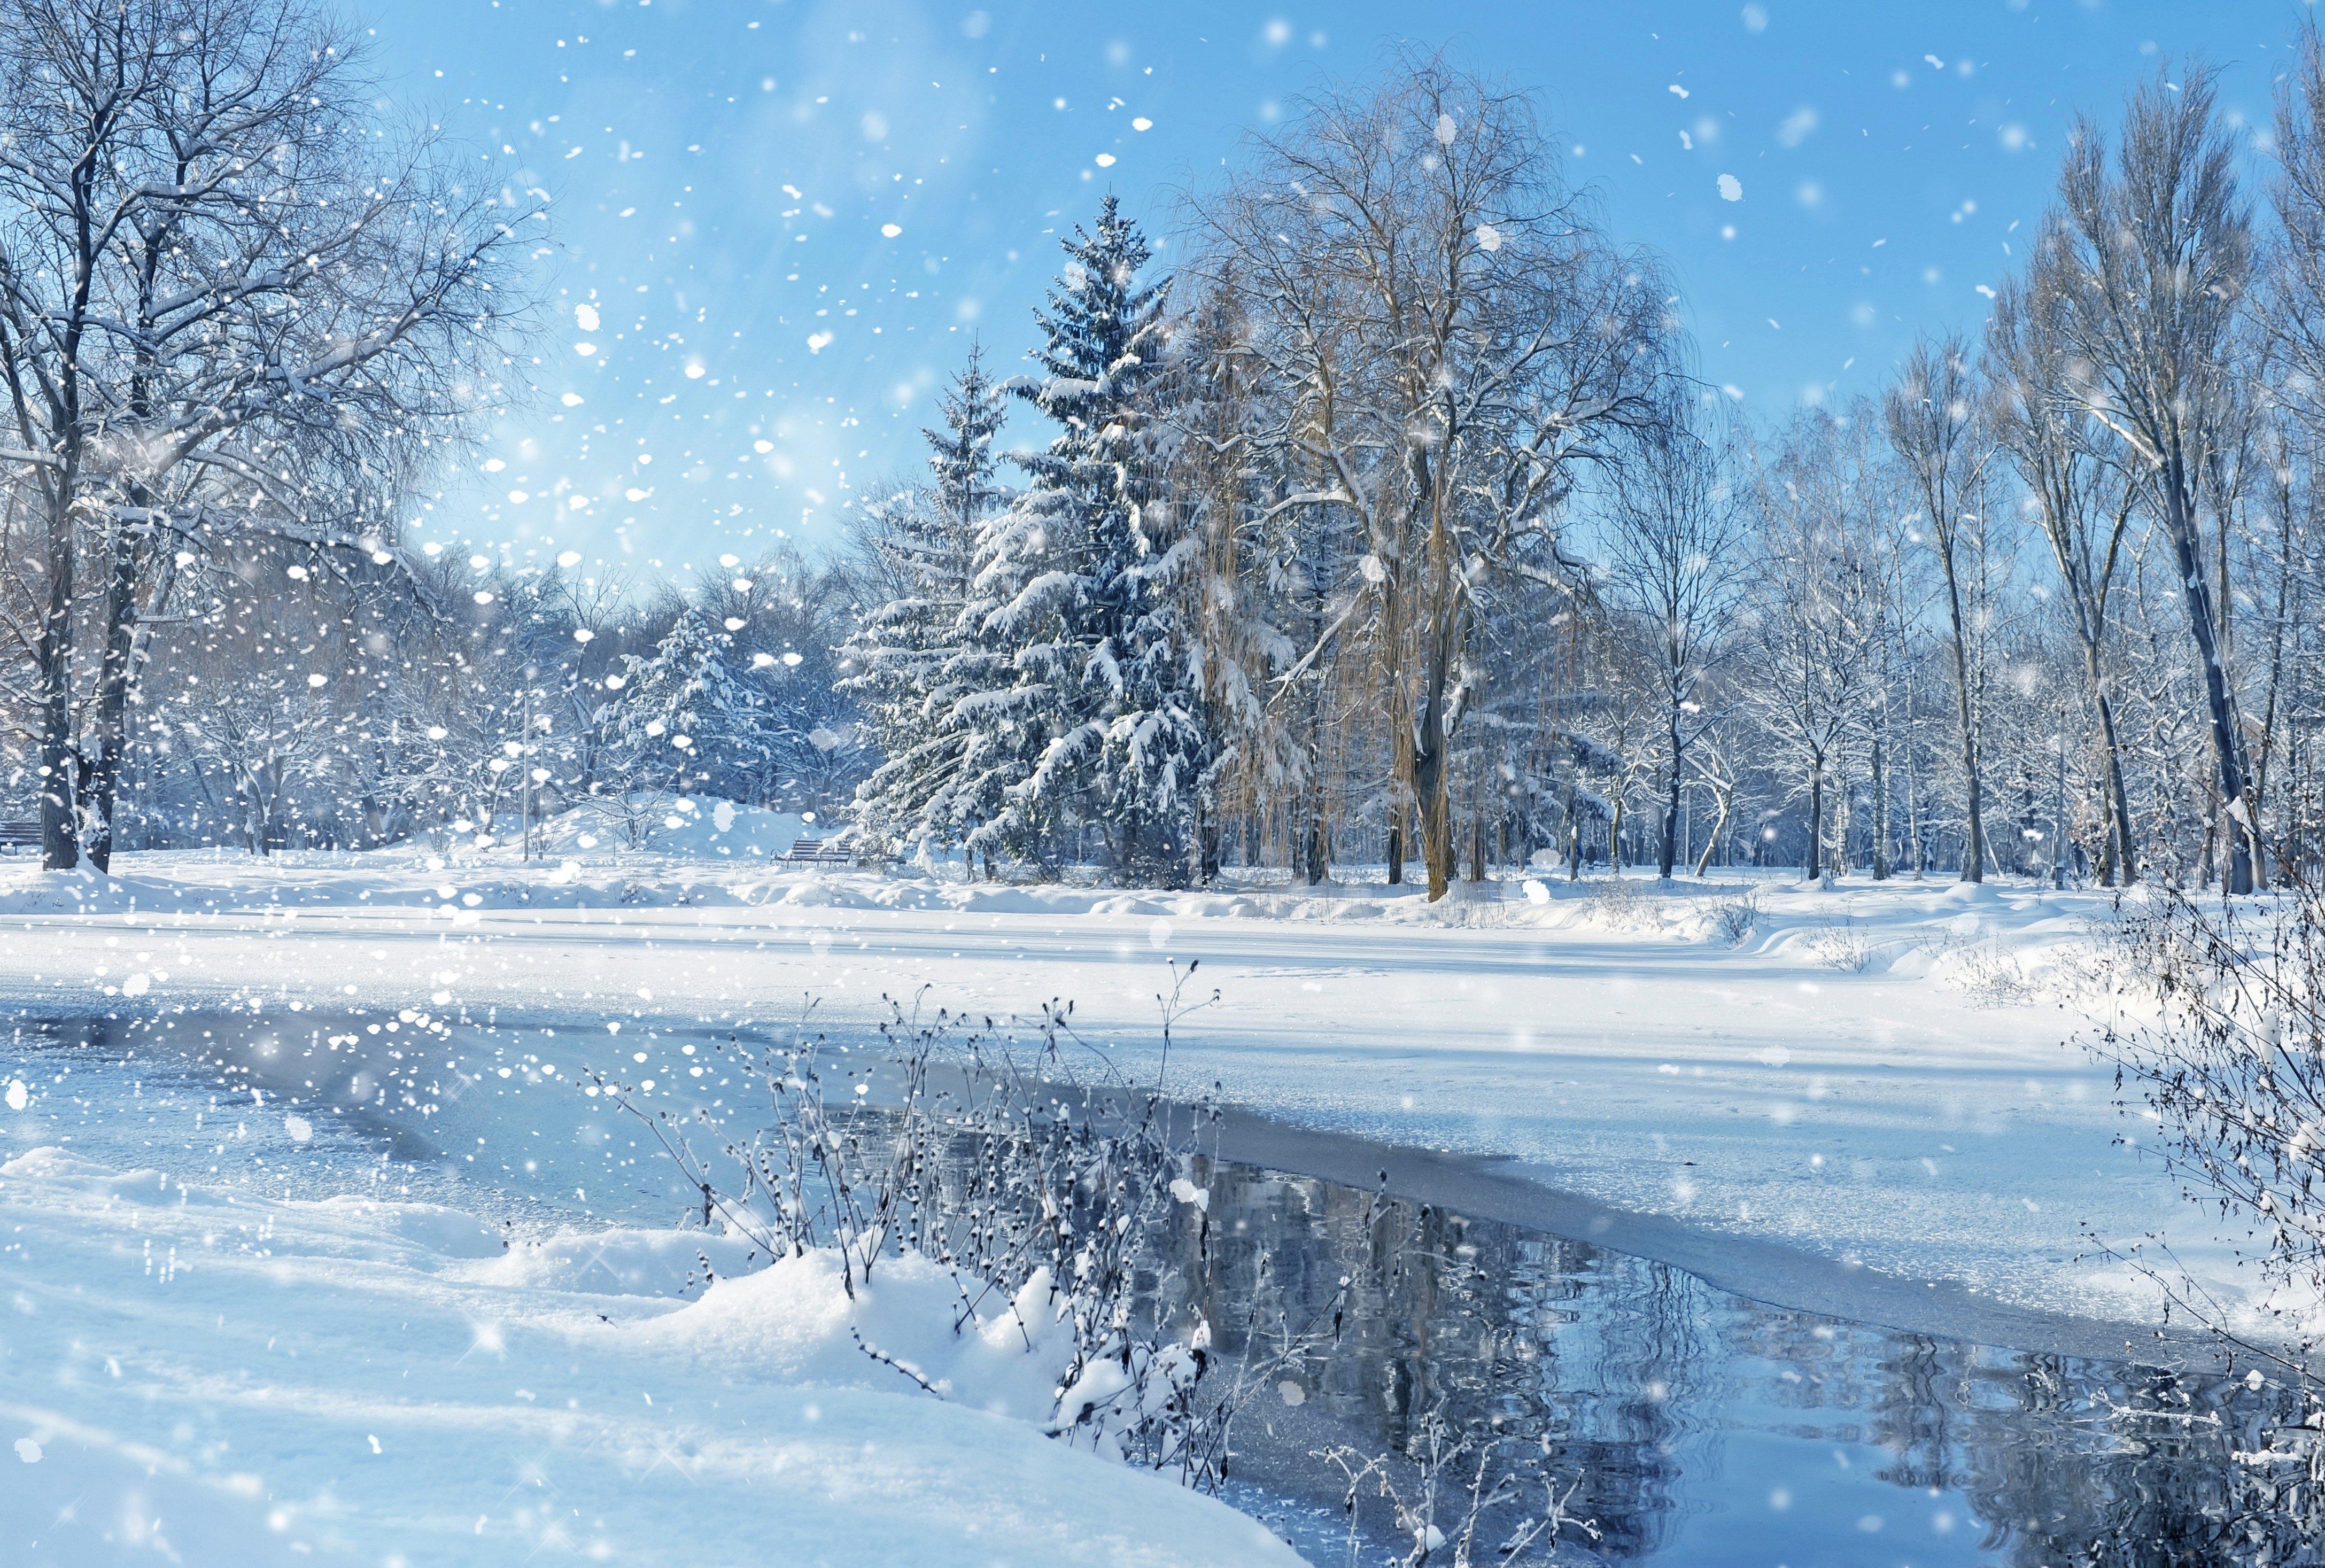 Landscape nature sky trees winter christmas wallpaper - Christmas nature wallpaper ...